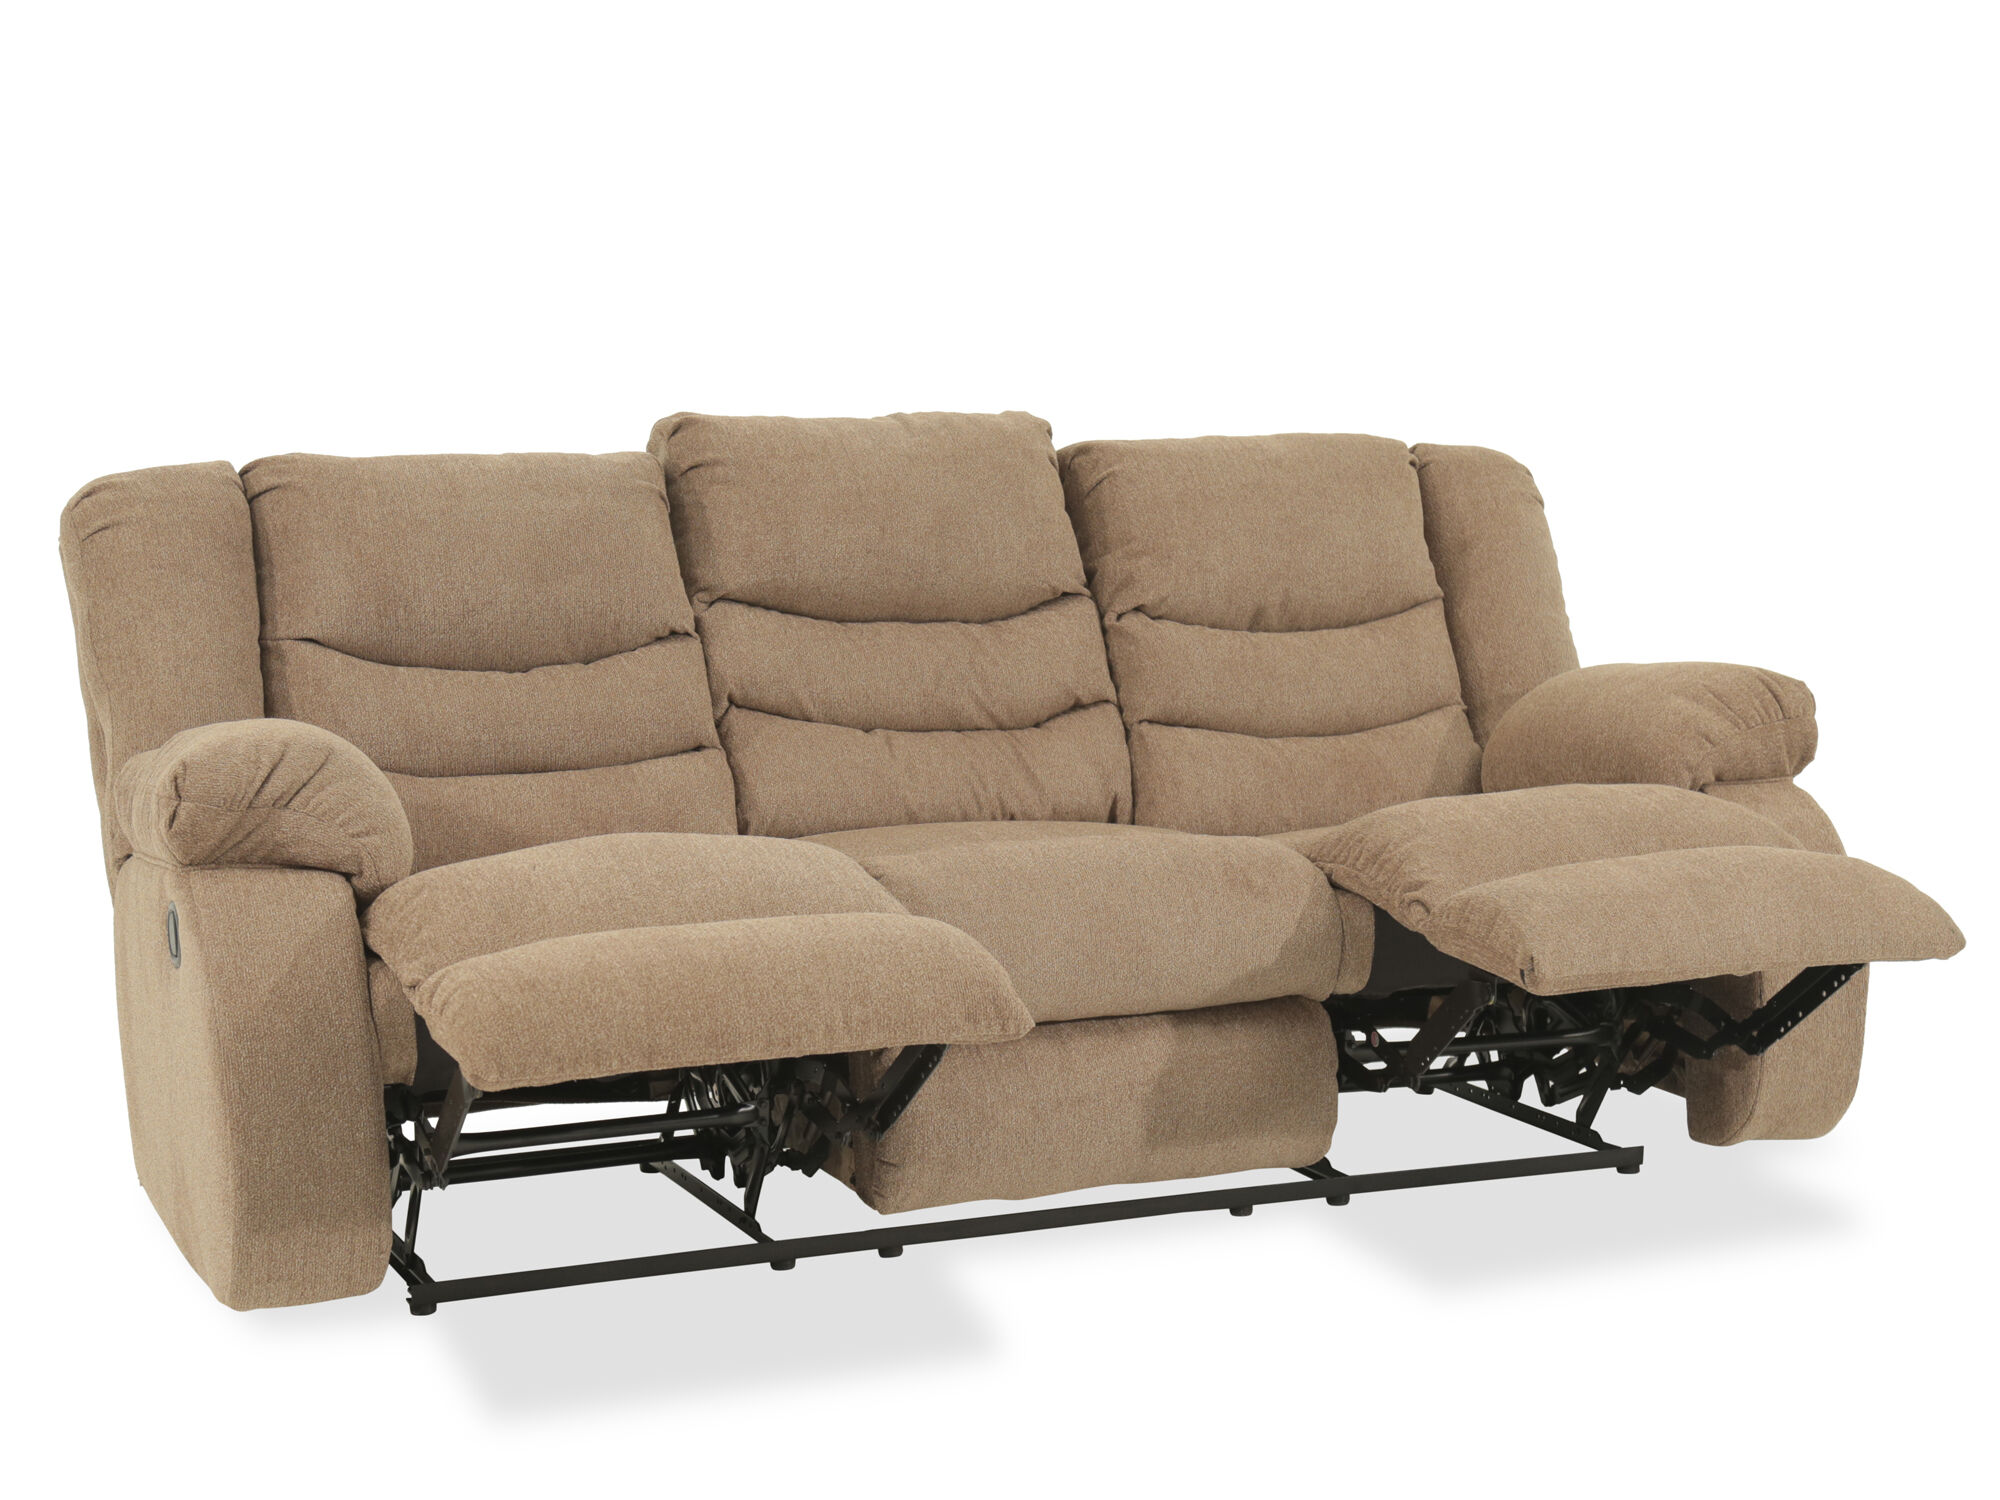 ashley furniture morandi mocha sofa double chaise sectional tulen reclining mathis brothers